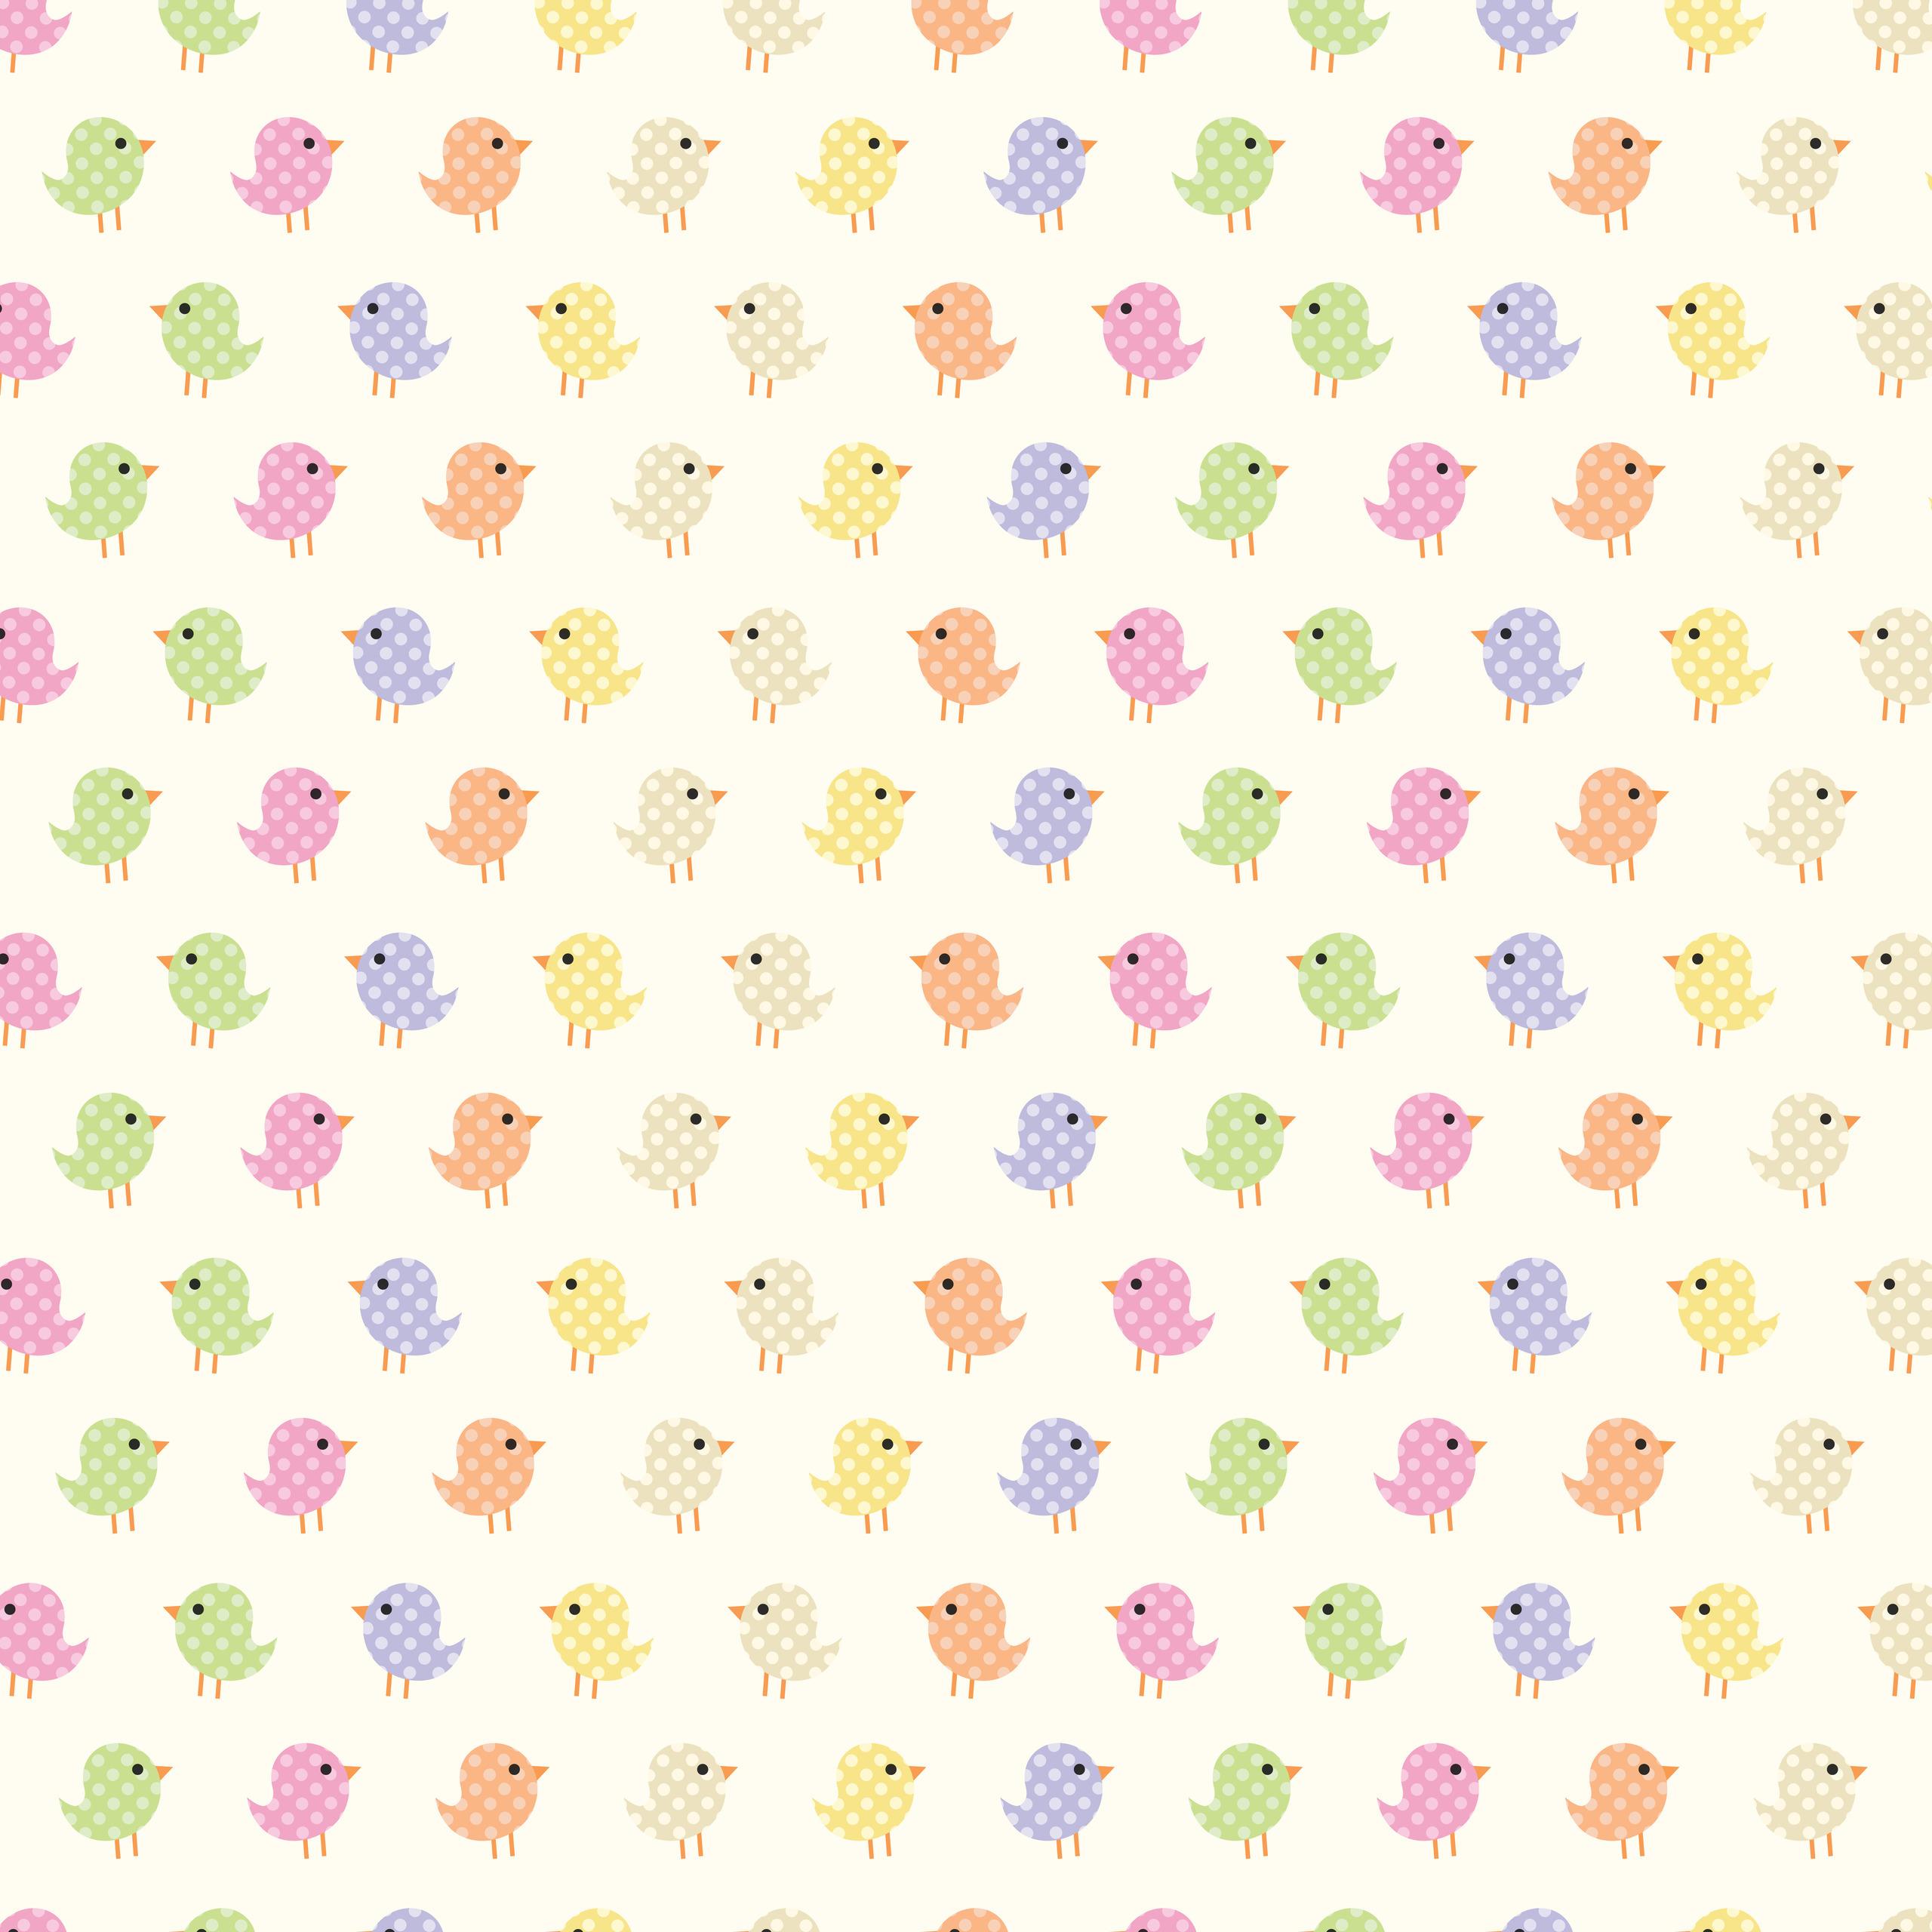 pattern Birds - birds, cute, birds - acberdec | ello